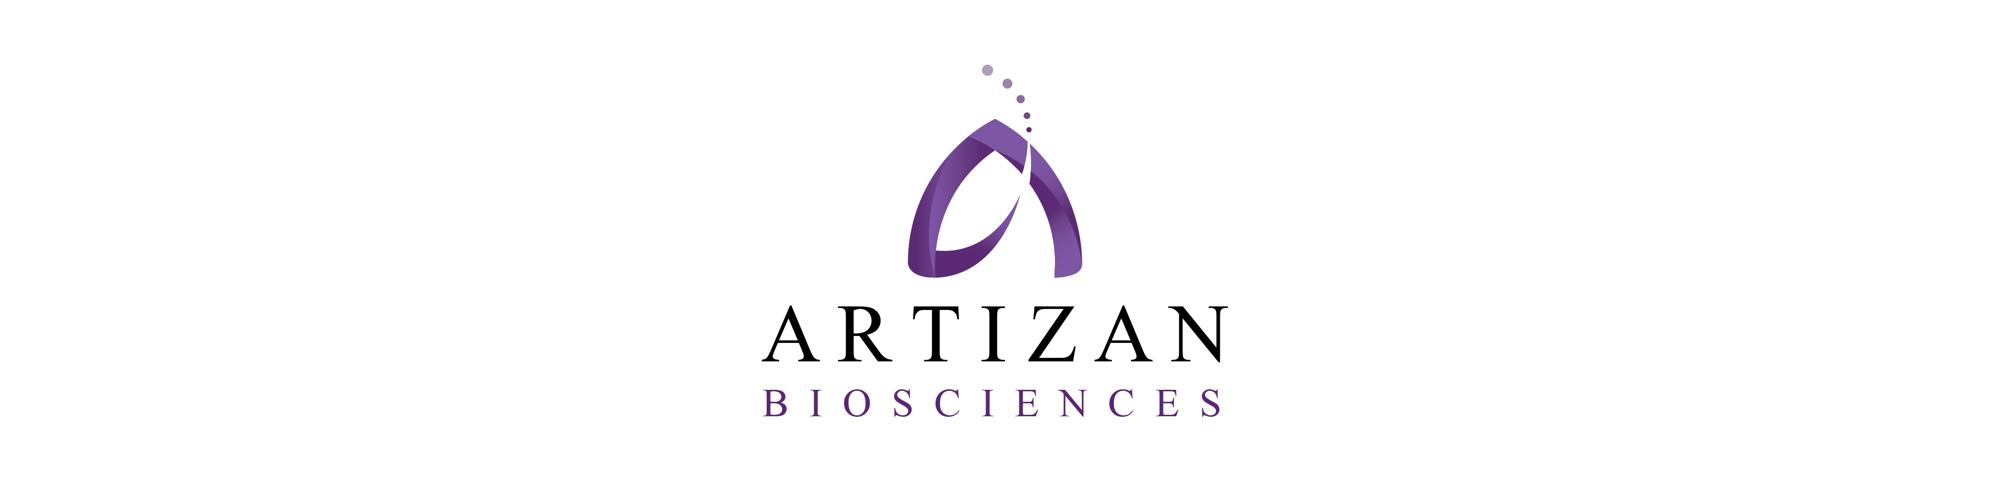 Artizan Bioscience